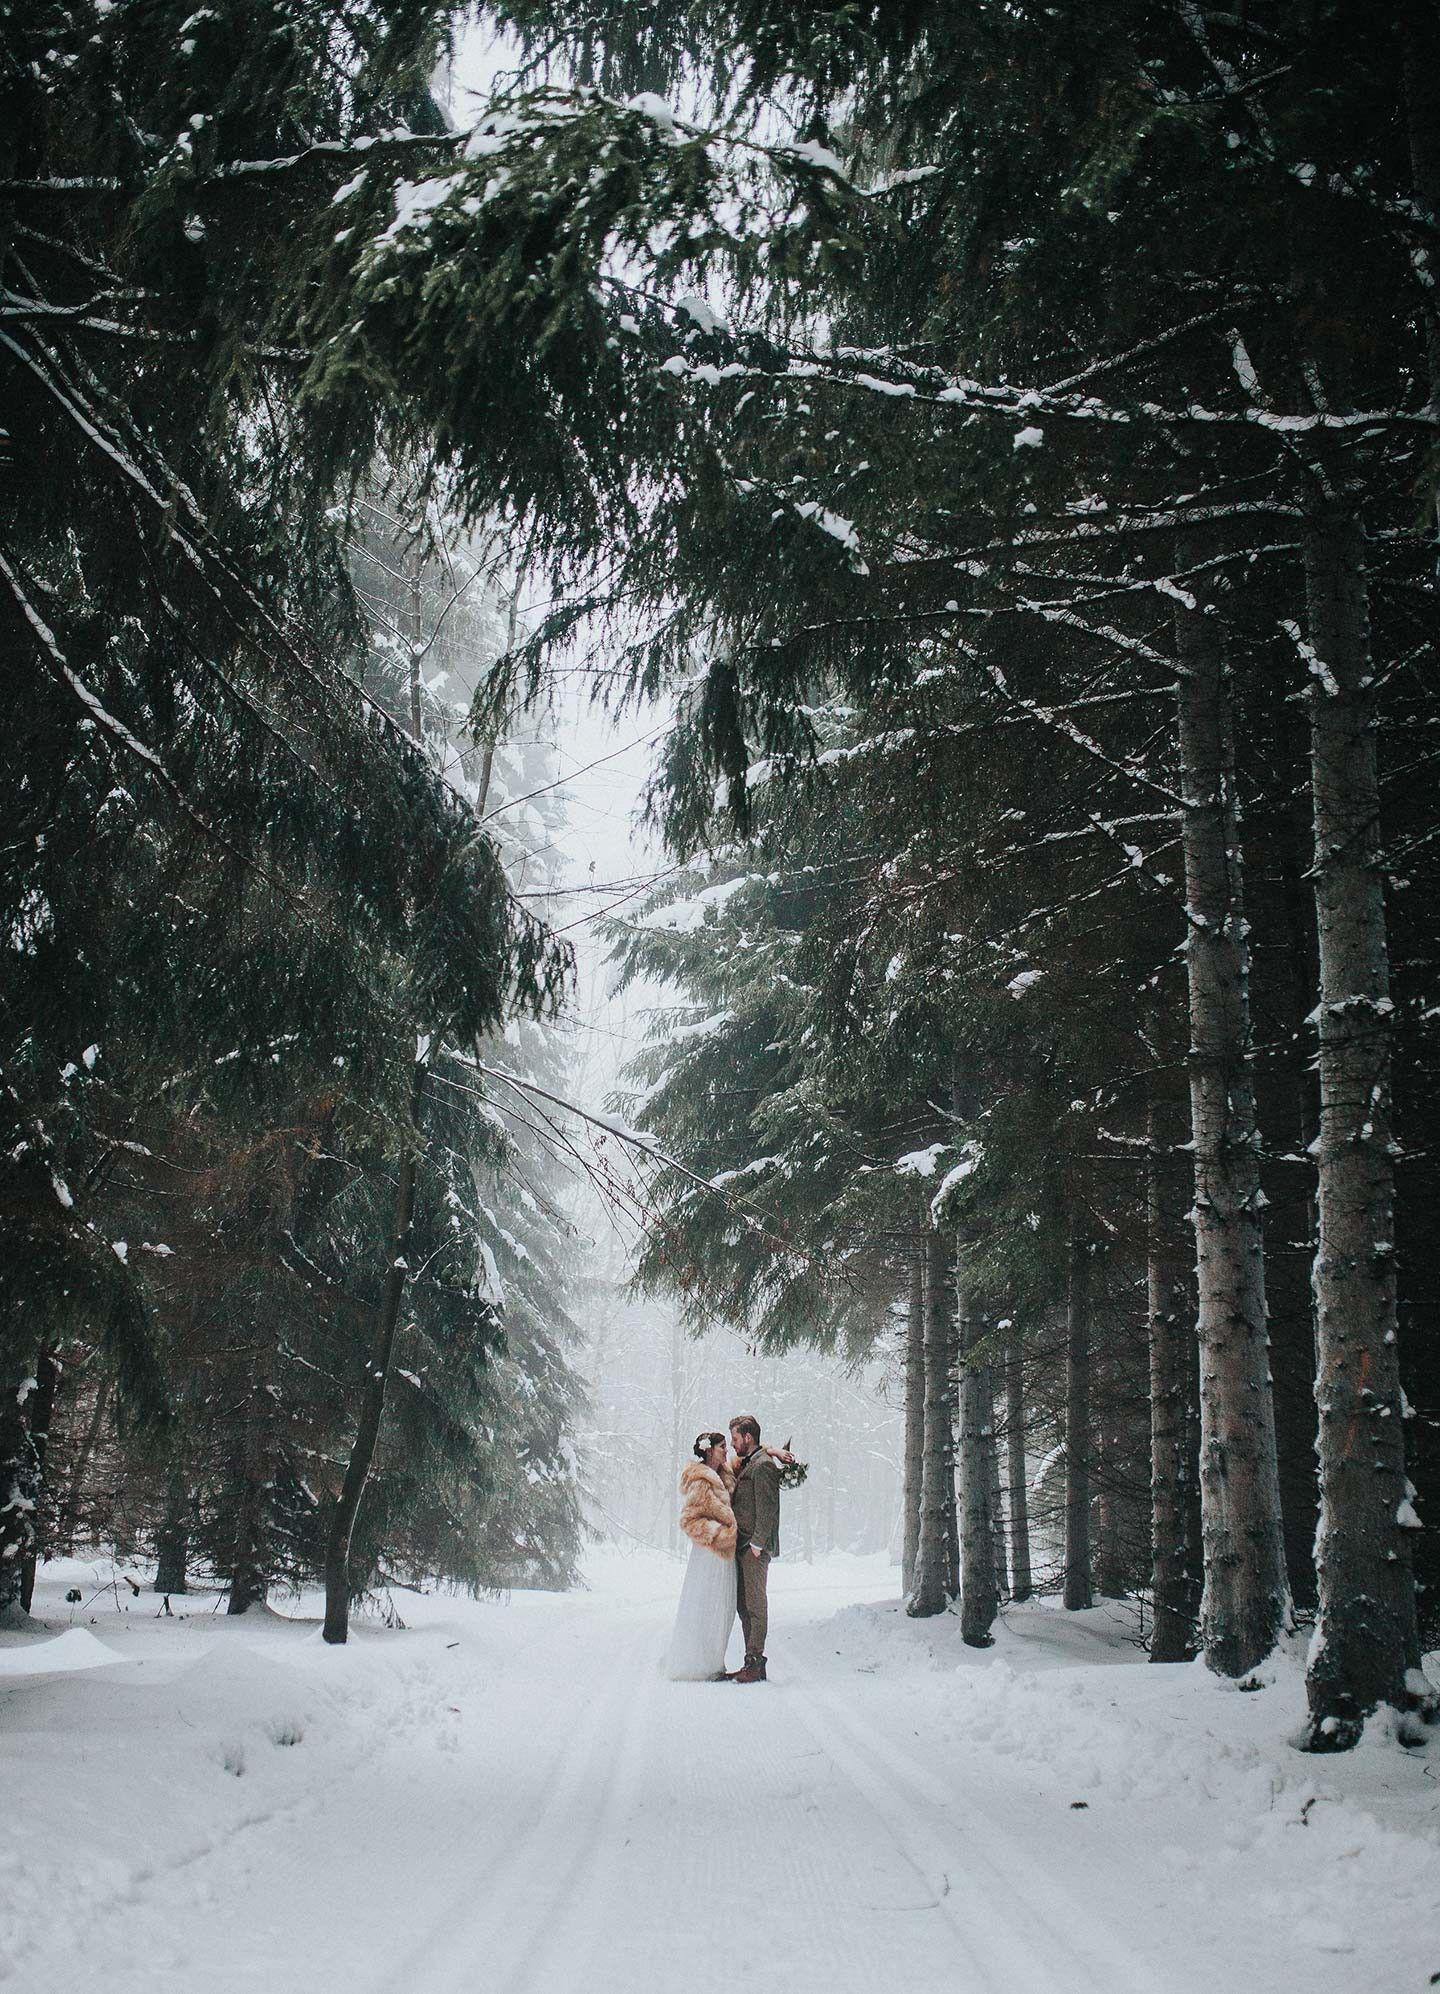 Wooden Wedding Winterhochzeitsidee Im Wald Wedding Things